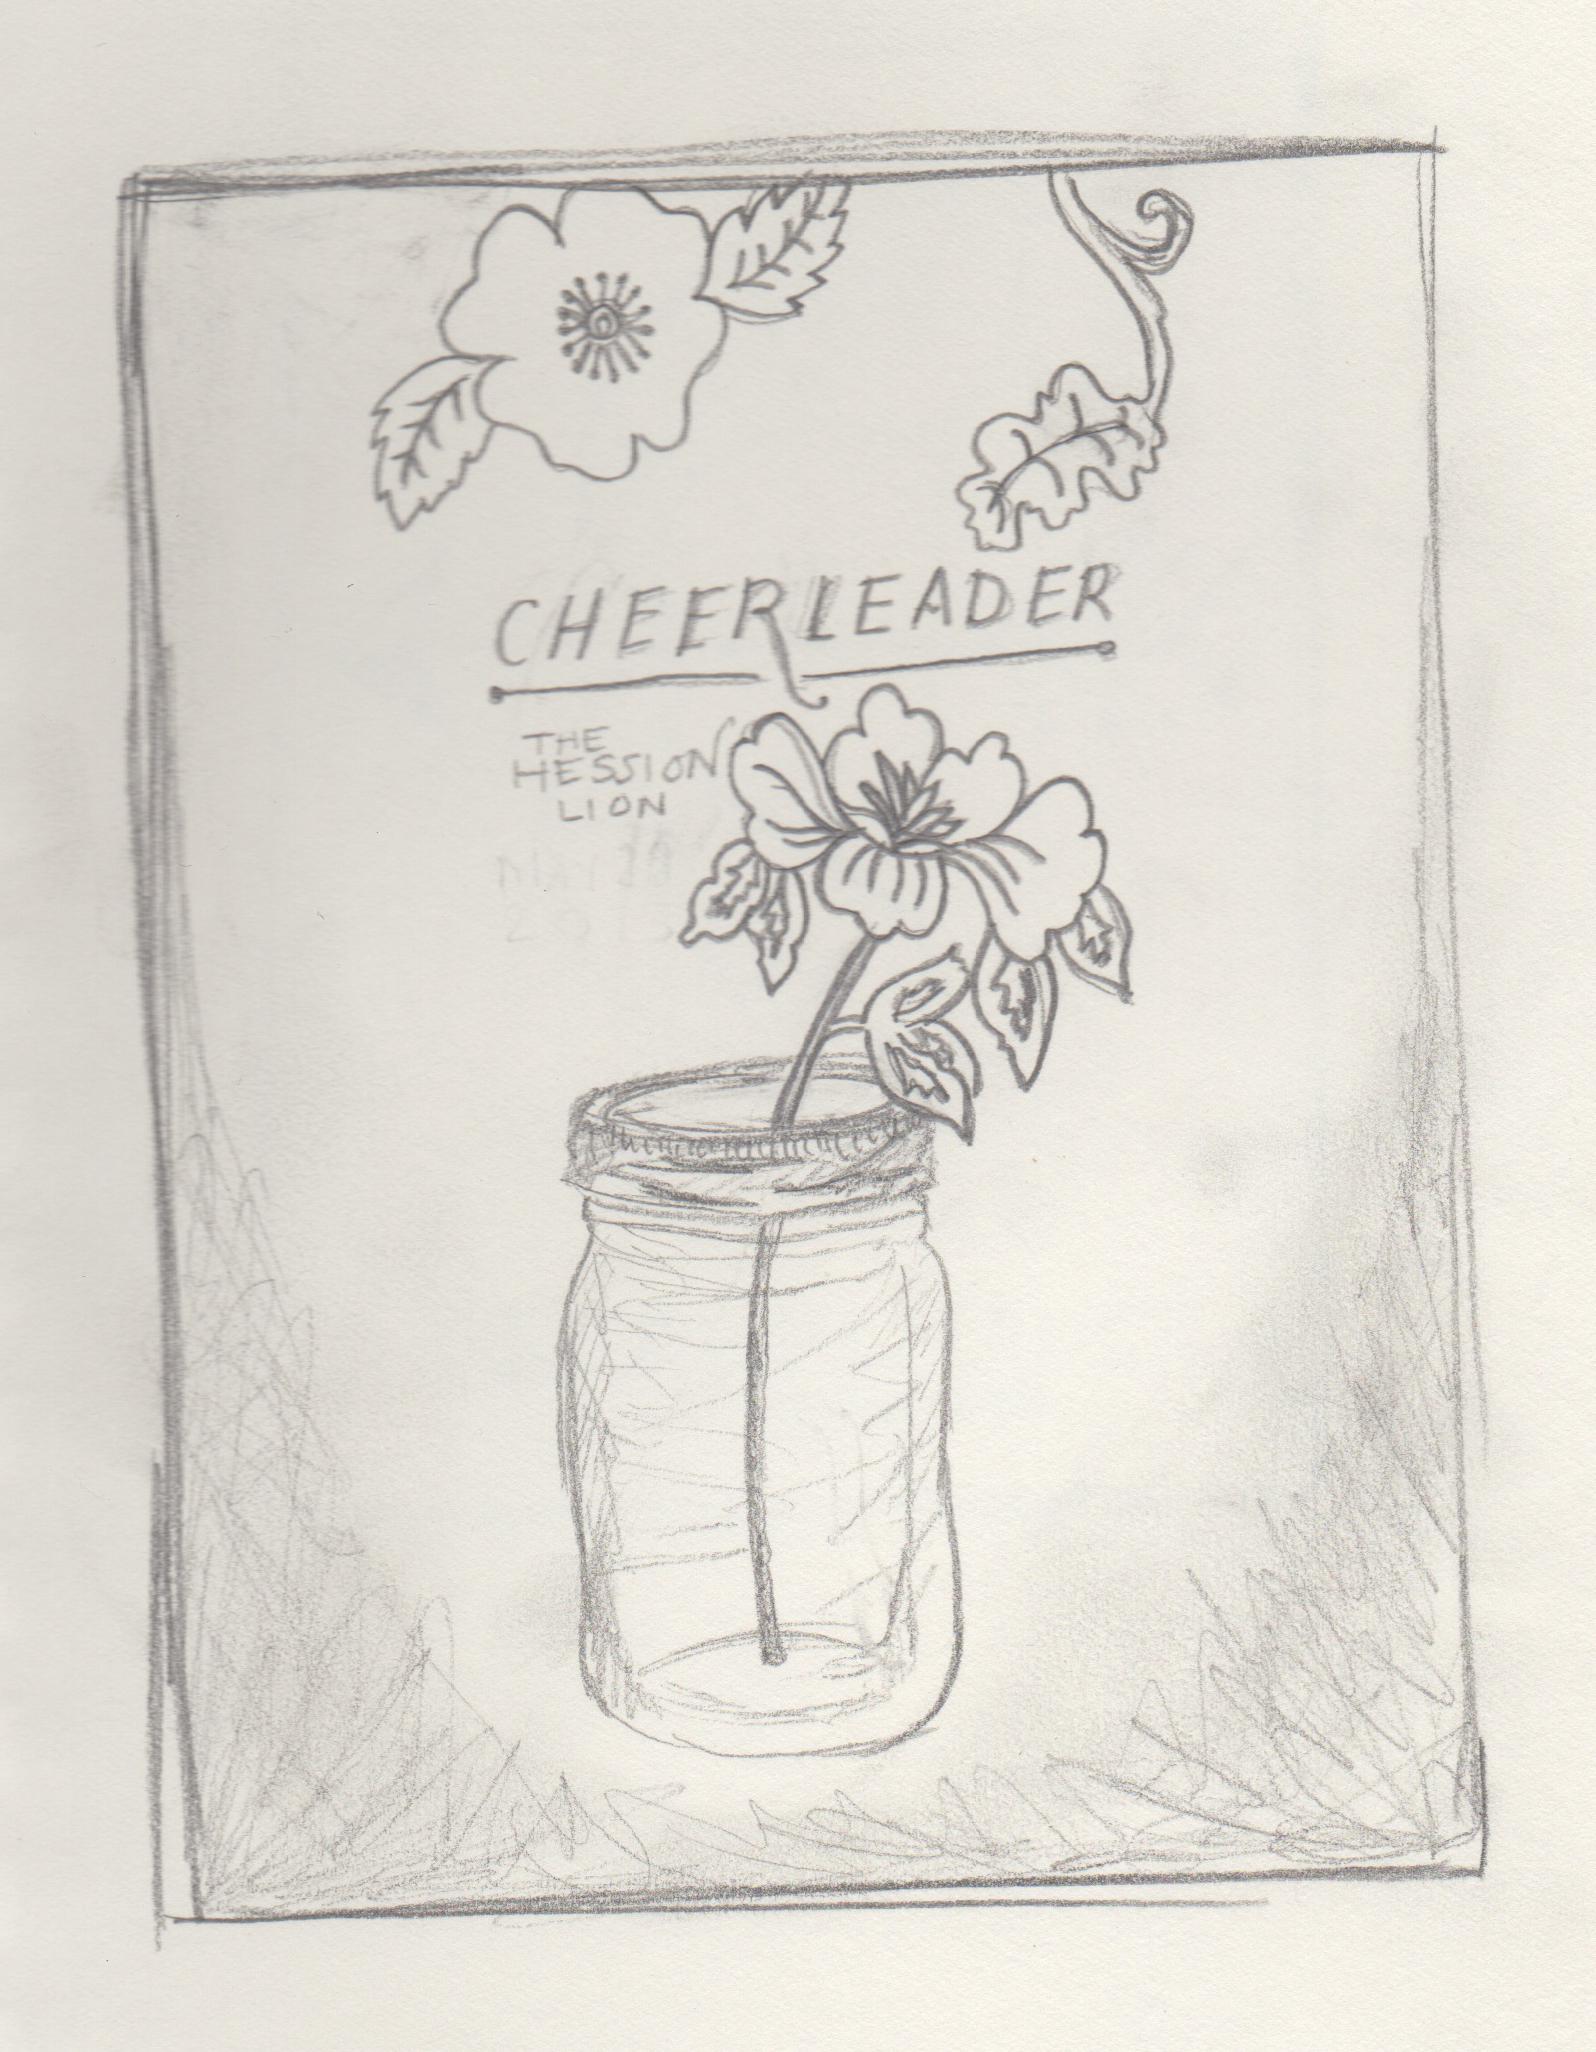 Cheerleader - image 3 - student project